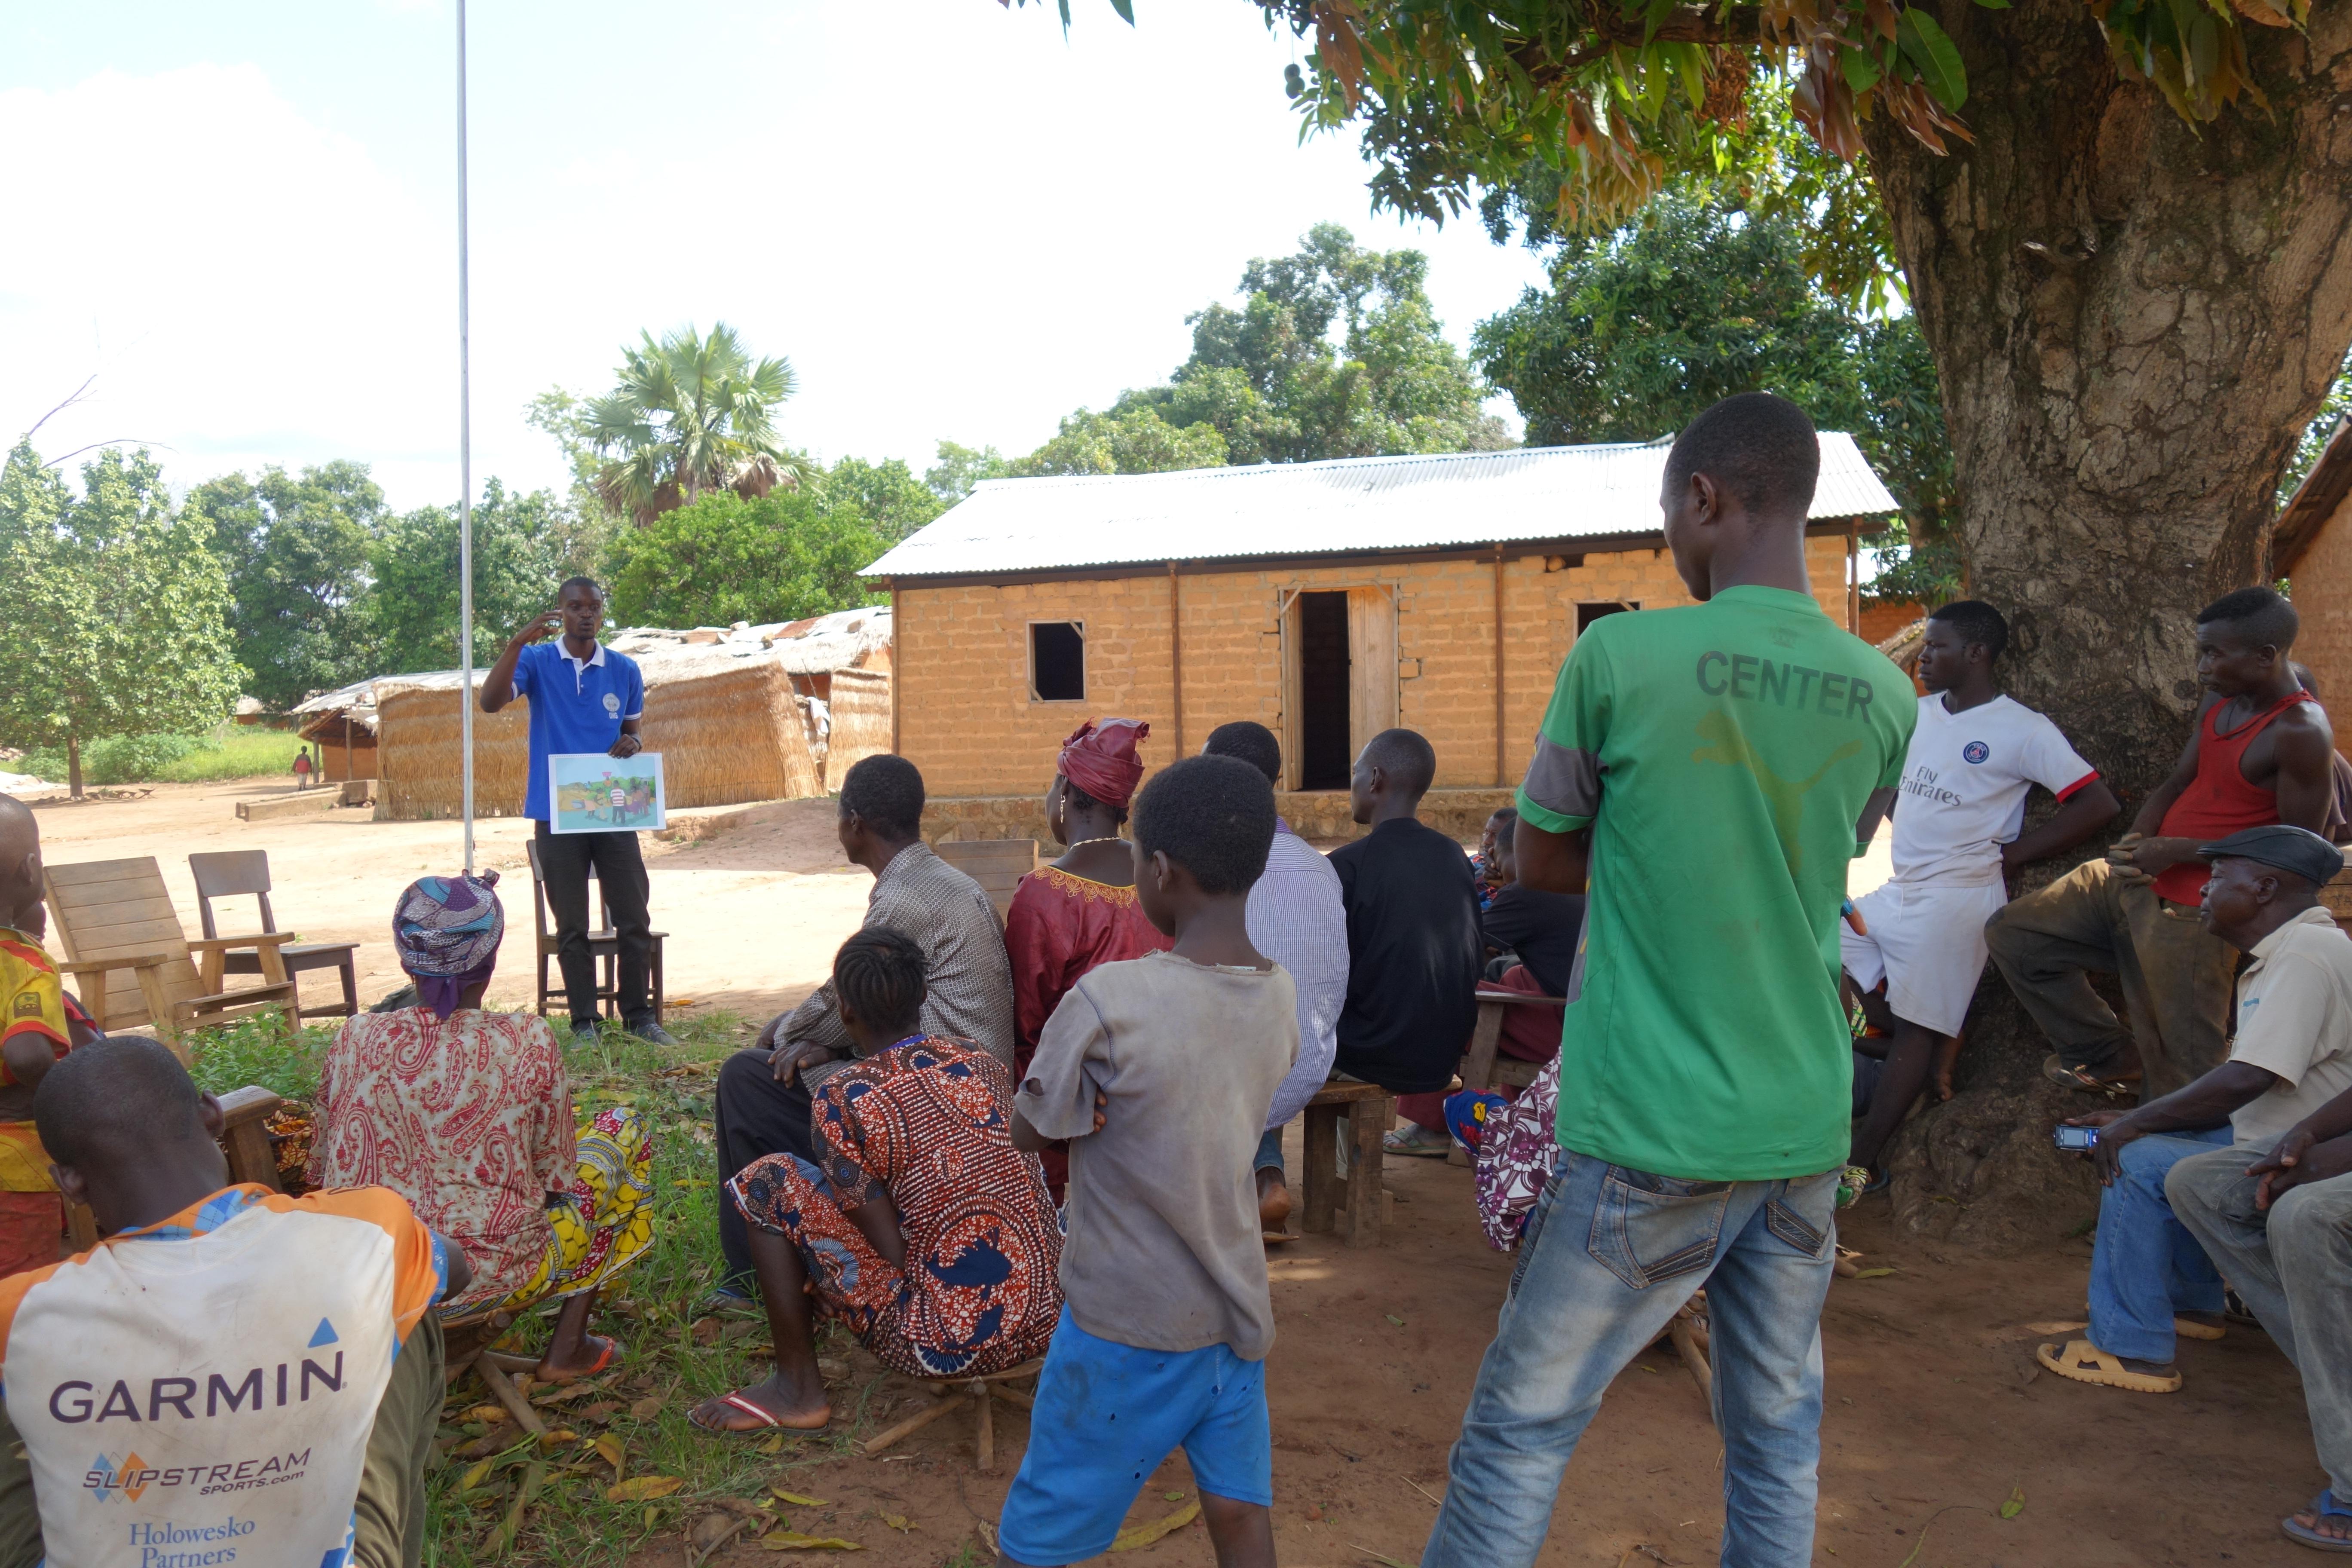 Child Soldiers International partner, Enfants Sans Frontieres, delivers community workshop on preventing child recruitment.